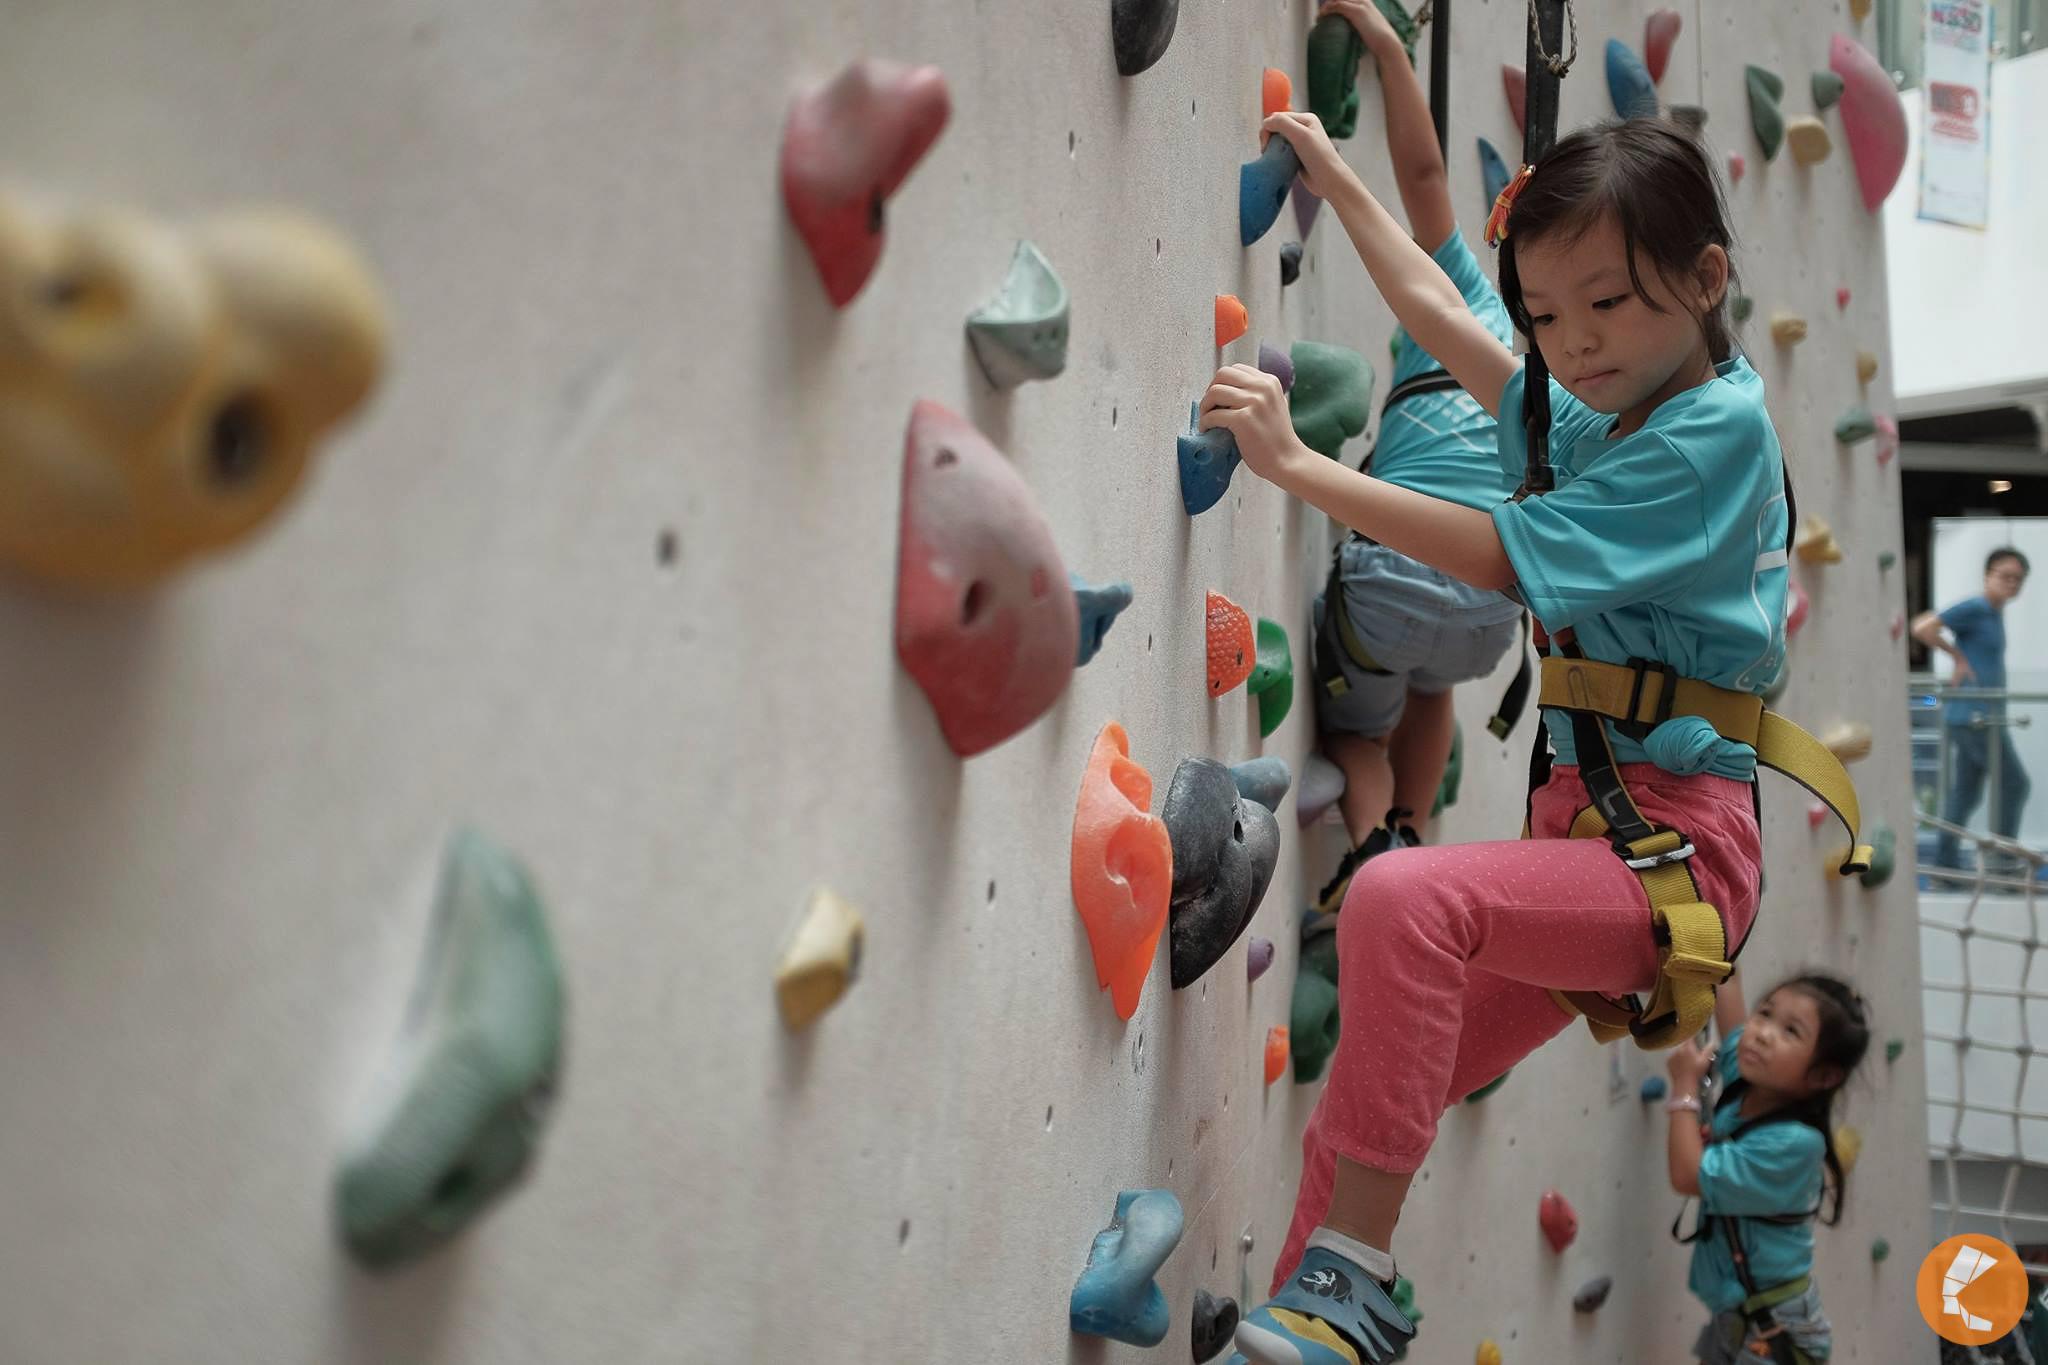 climber all ages 1.jpg